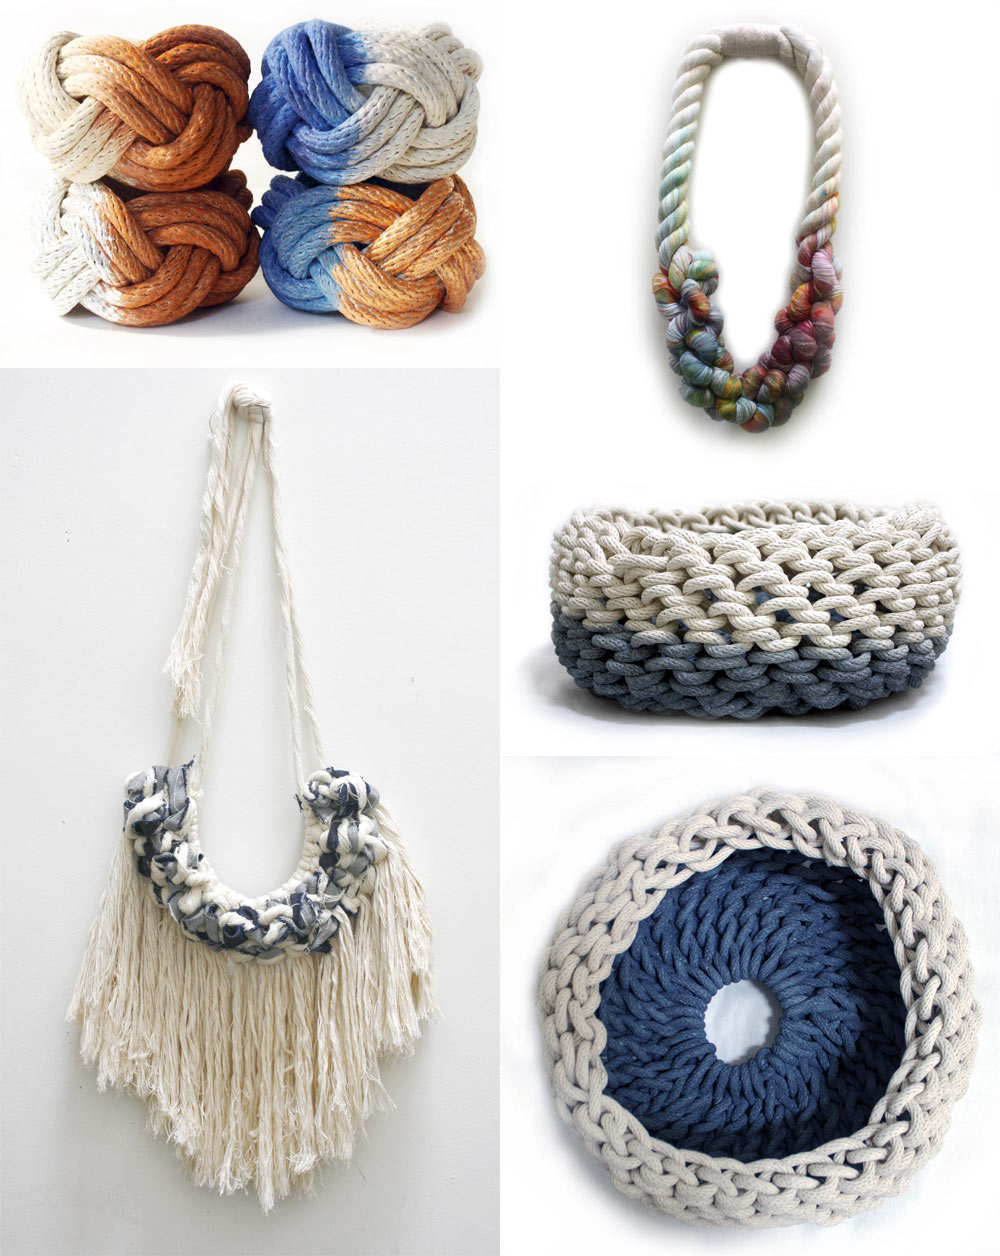 Tanya's rope jewelry, wall hangings and fiber housewares